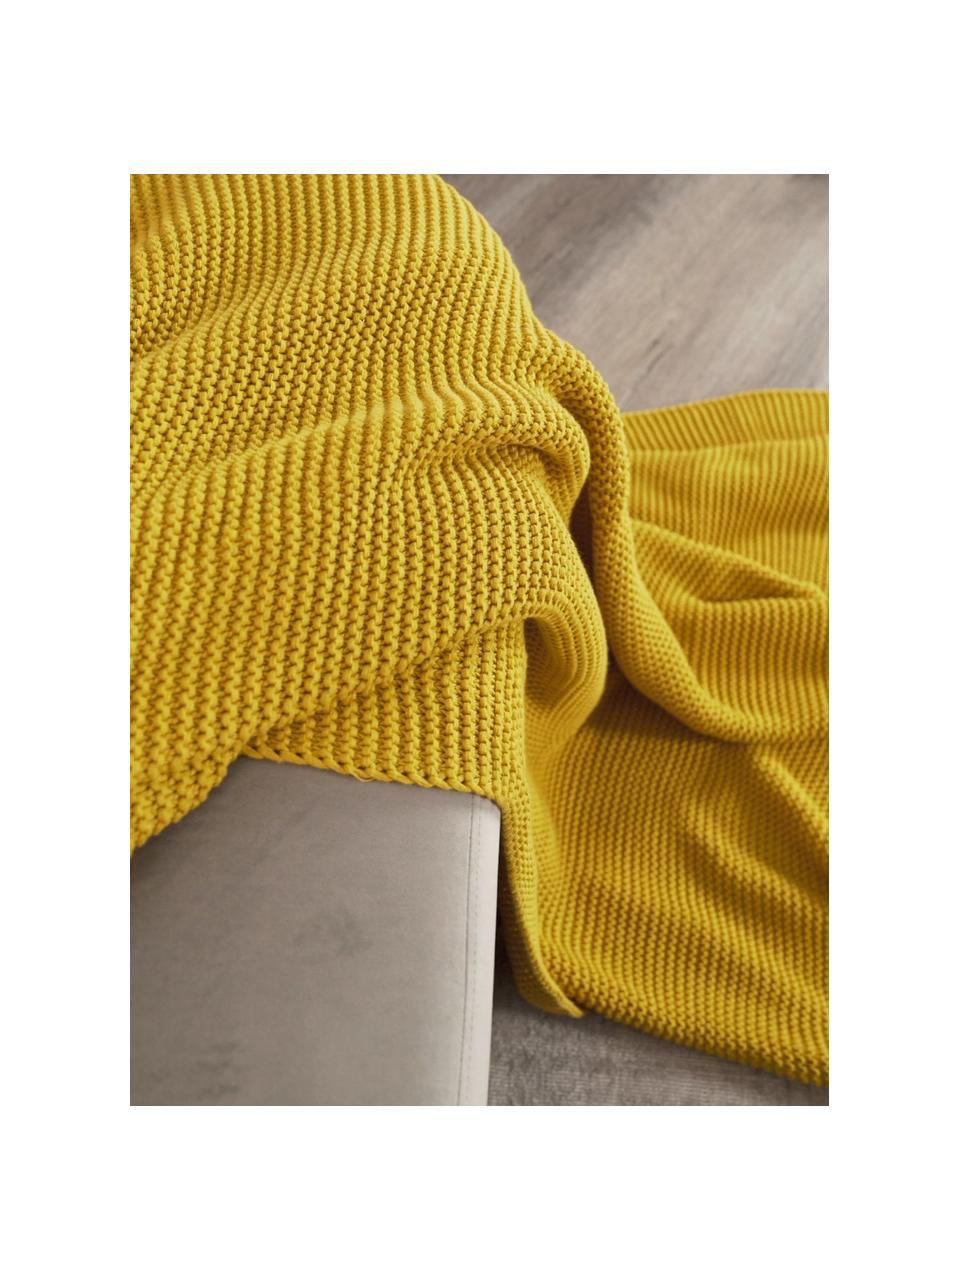 Strickdecke Adalyn aus Bio-Baumwolle in Senfgelb, 100% Bio-Baumwolle, GOTS-zertifiziert, Senfgelb, 150 x 200 cm